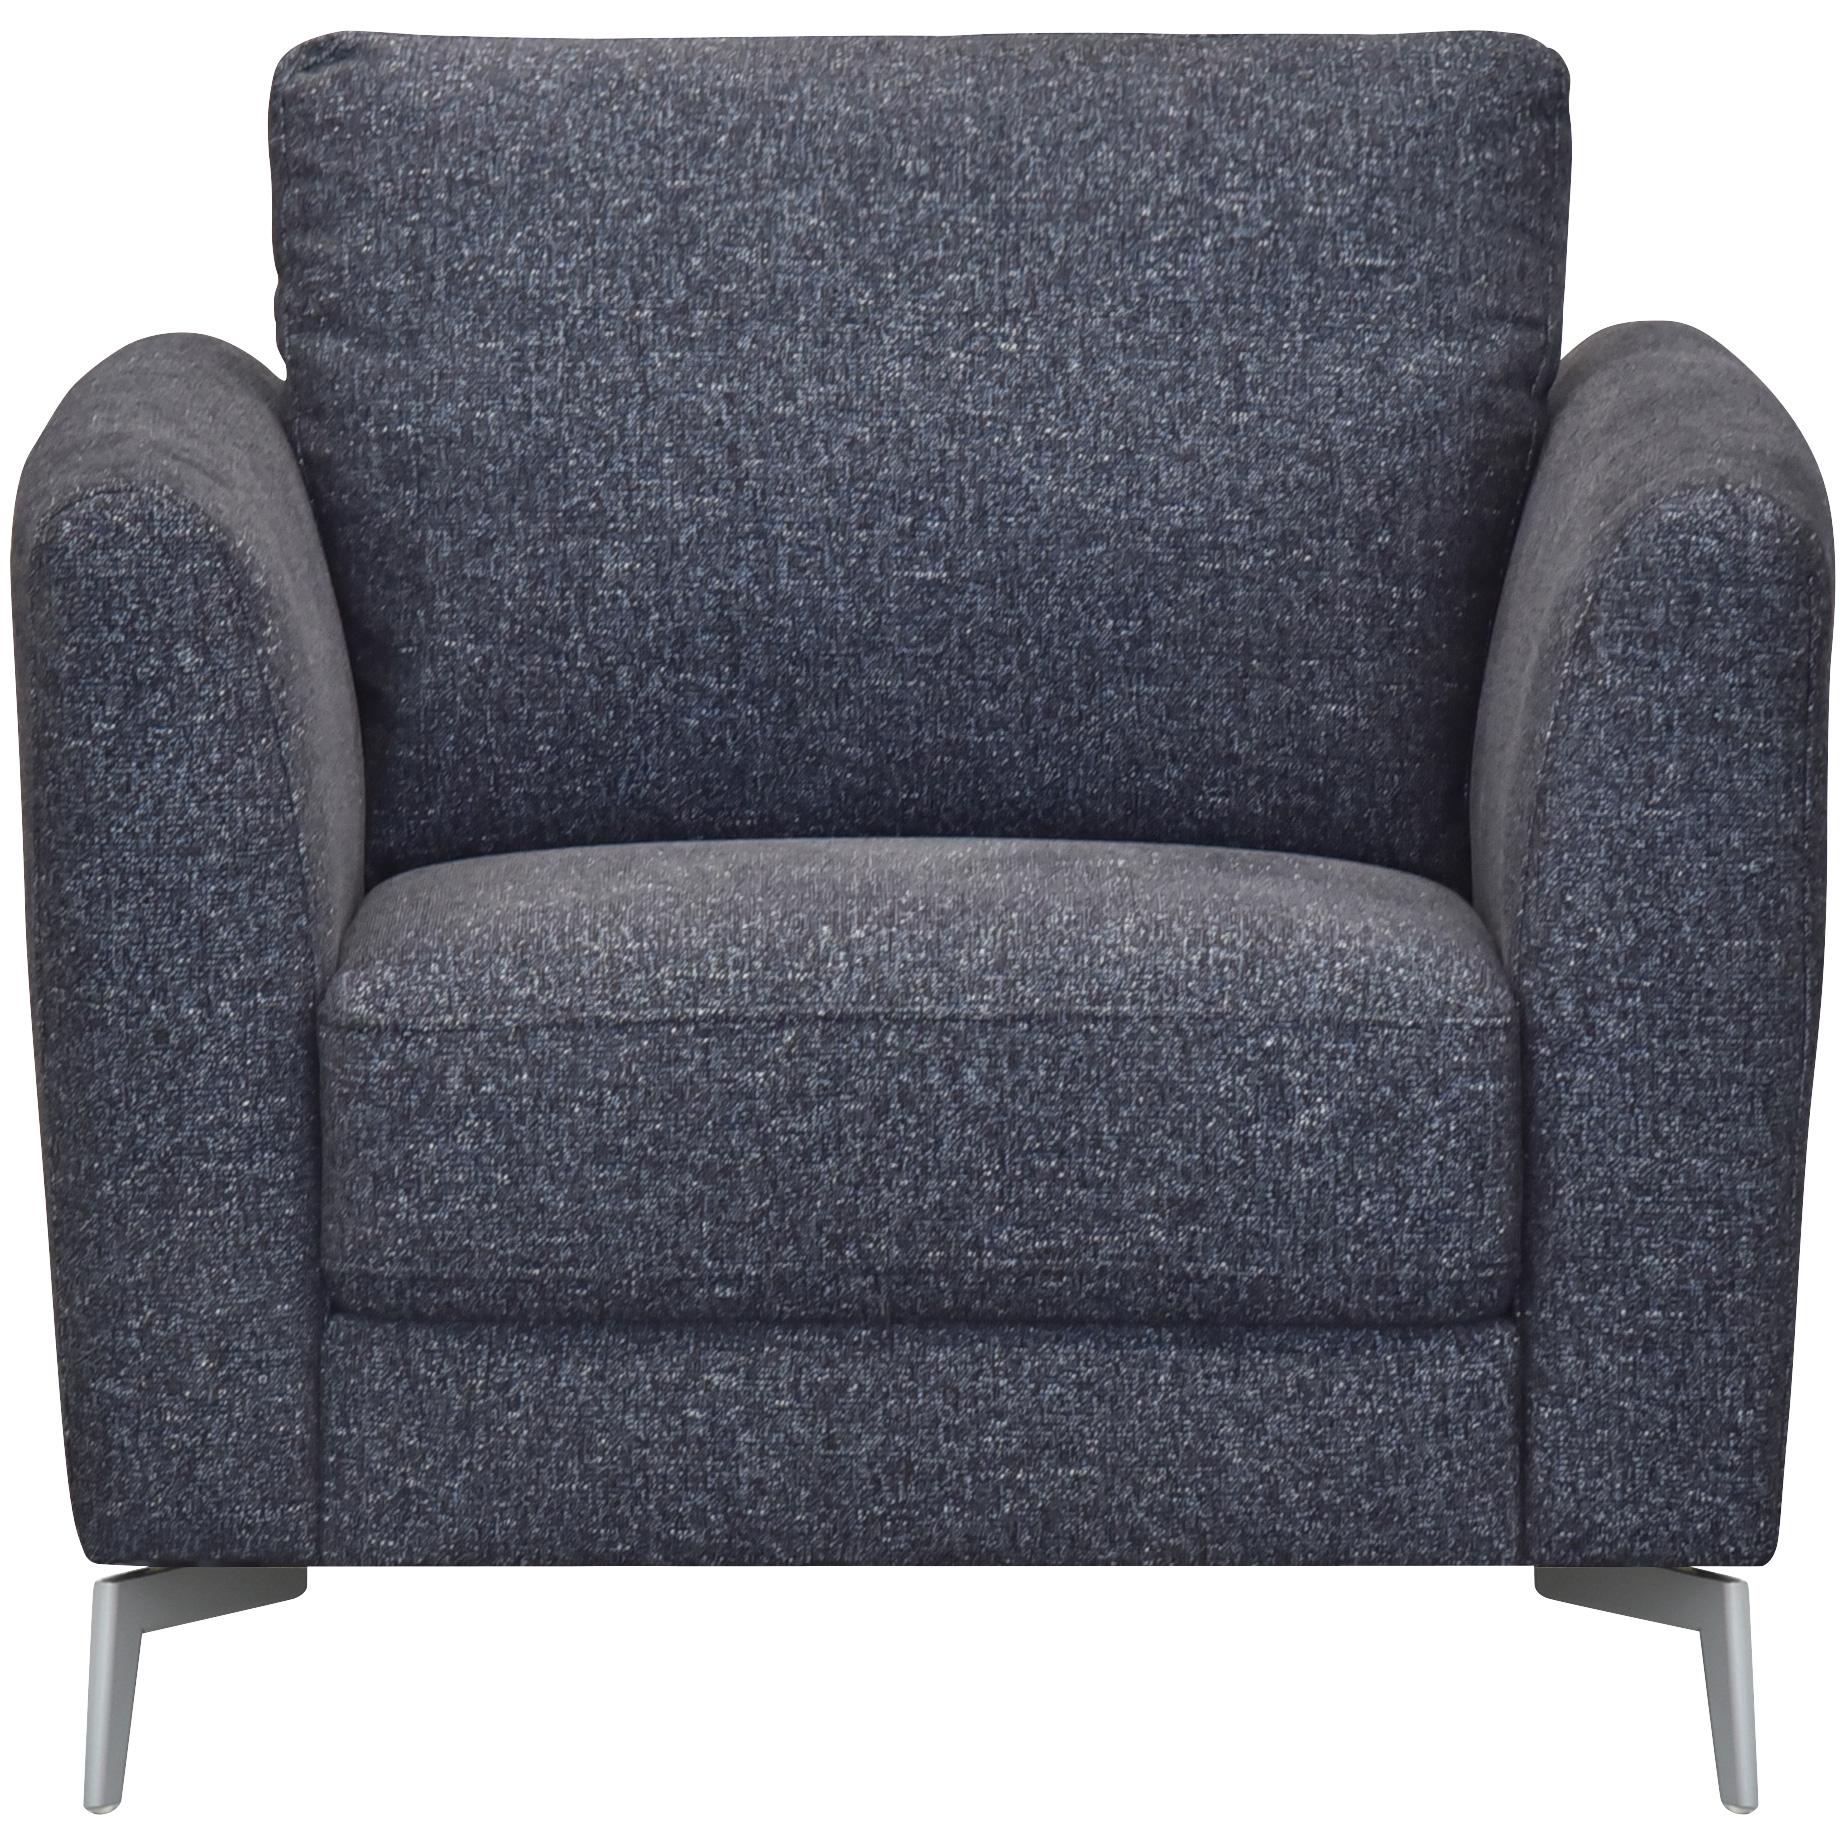 Terrace Living | Stockton Charcoal Chair